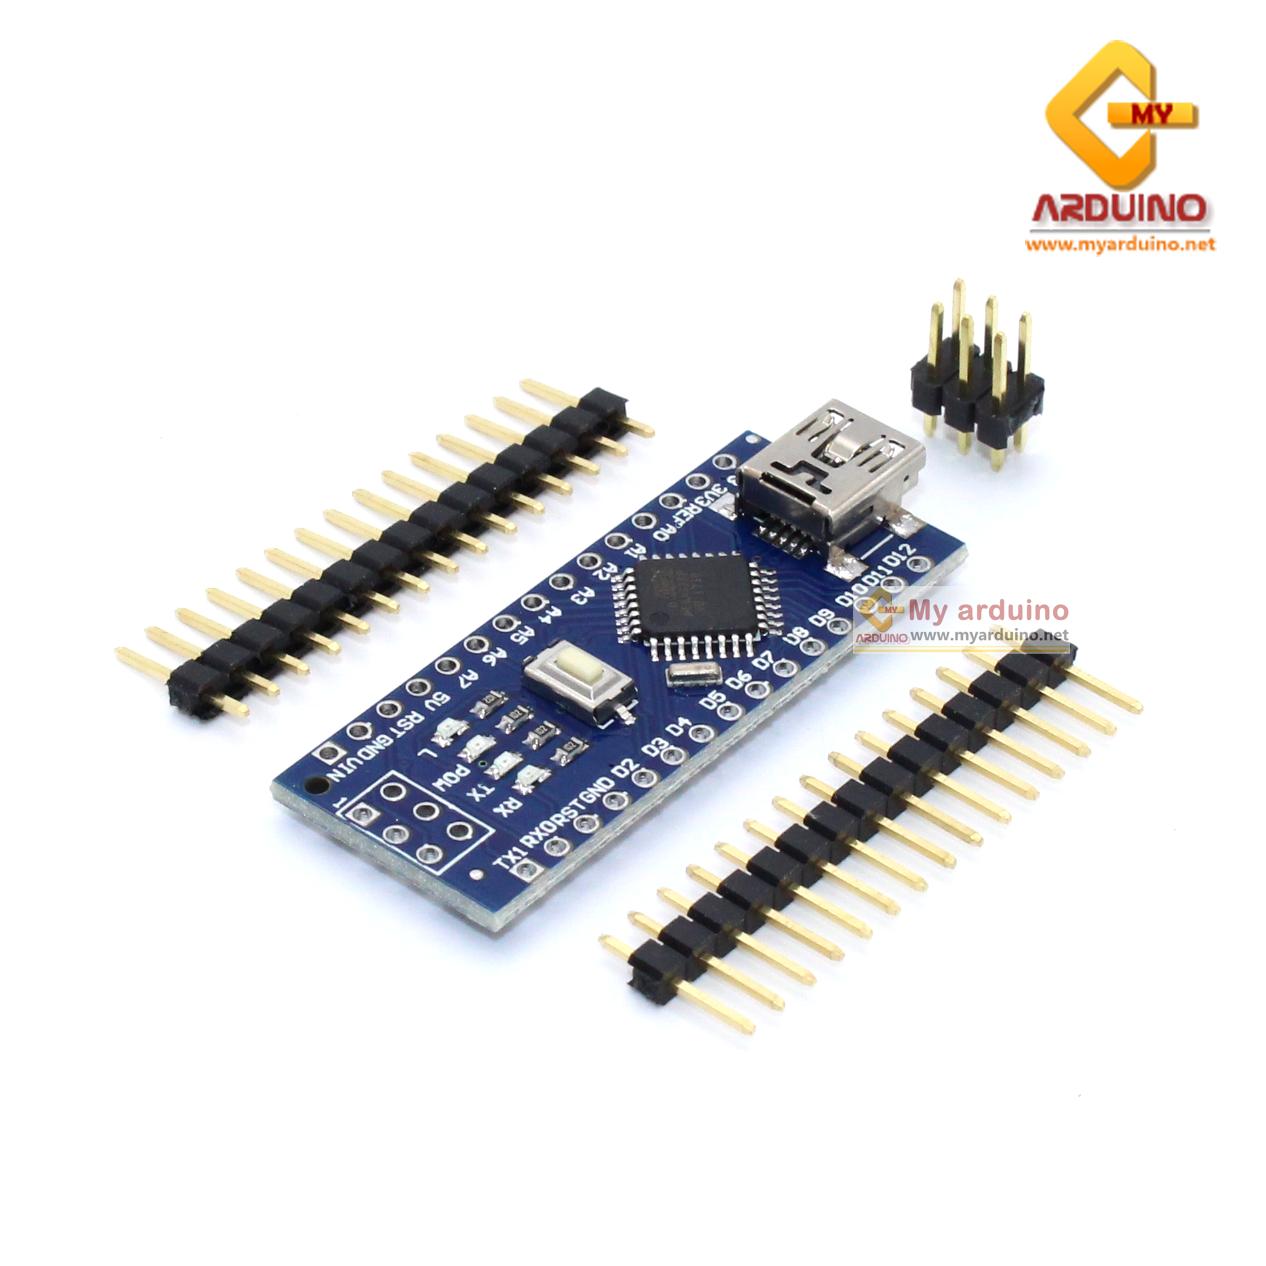 Arduino Nano 3.0 Mini USB รุ่นใหม่ชิฟ CH340G แบบยังไม่บัดกรีขา (ไม่มีสาย Mini USB)